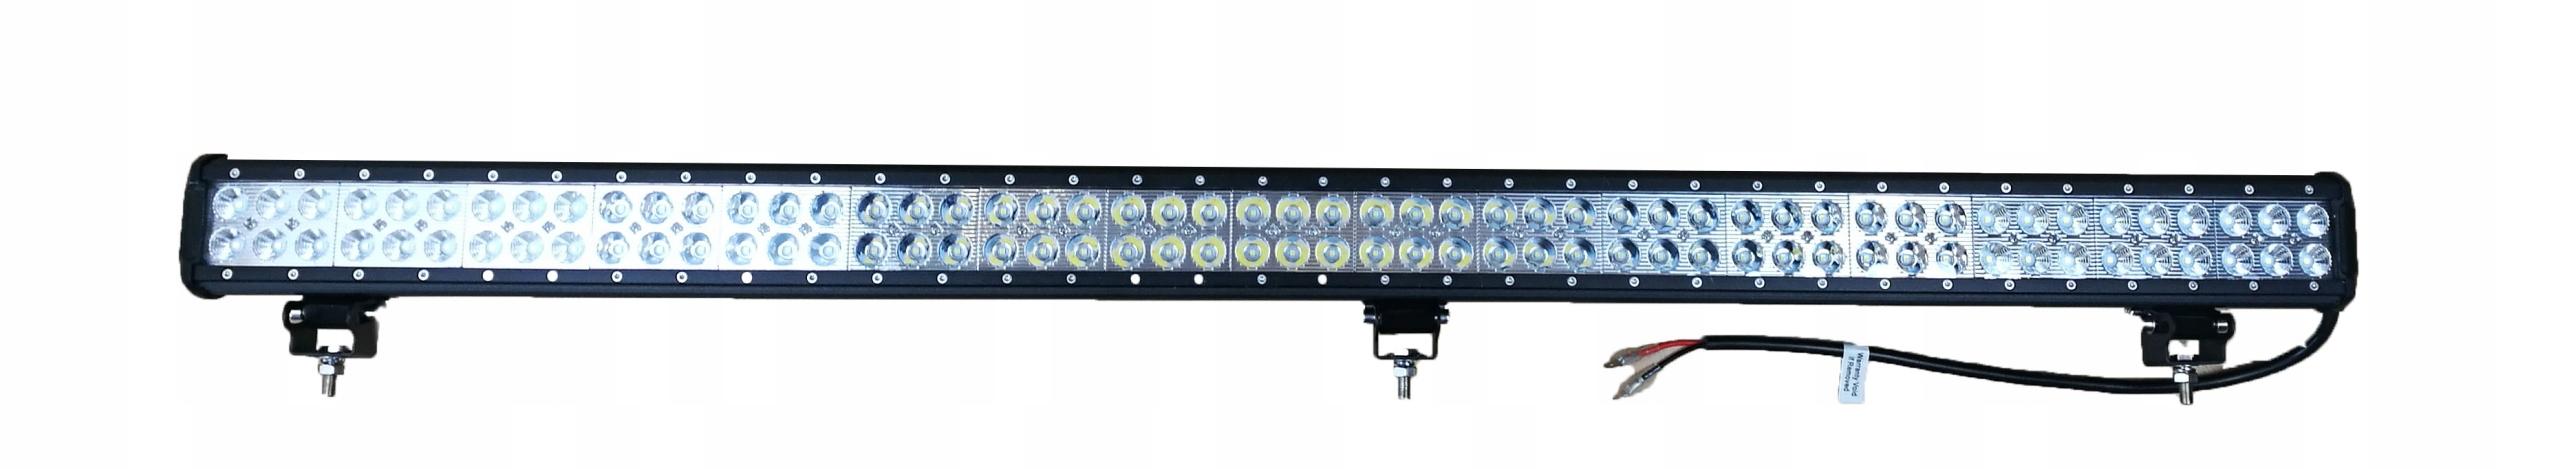 панель led галоген дальнего света планка 306w47'118cm